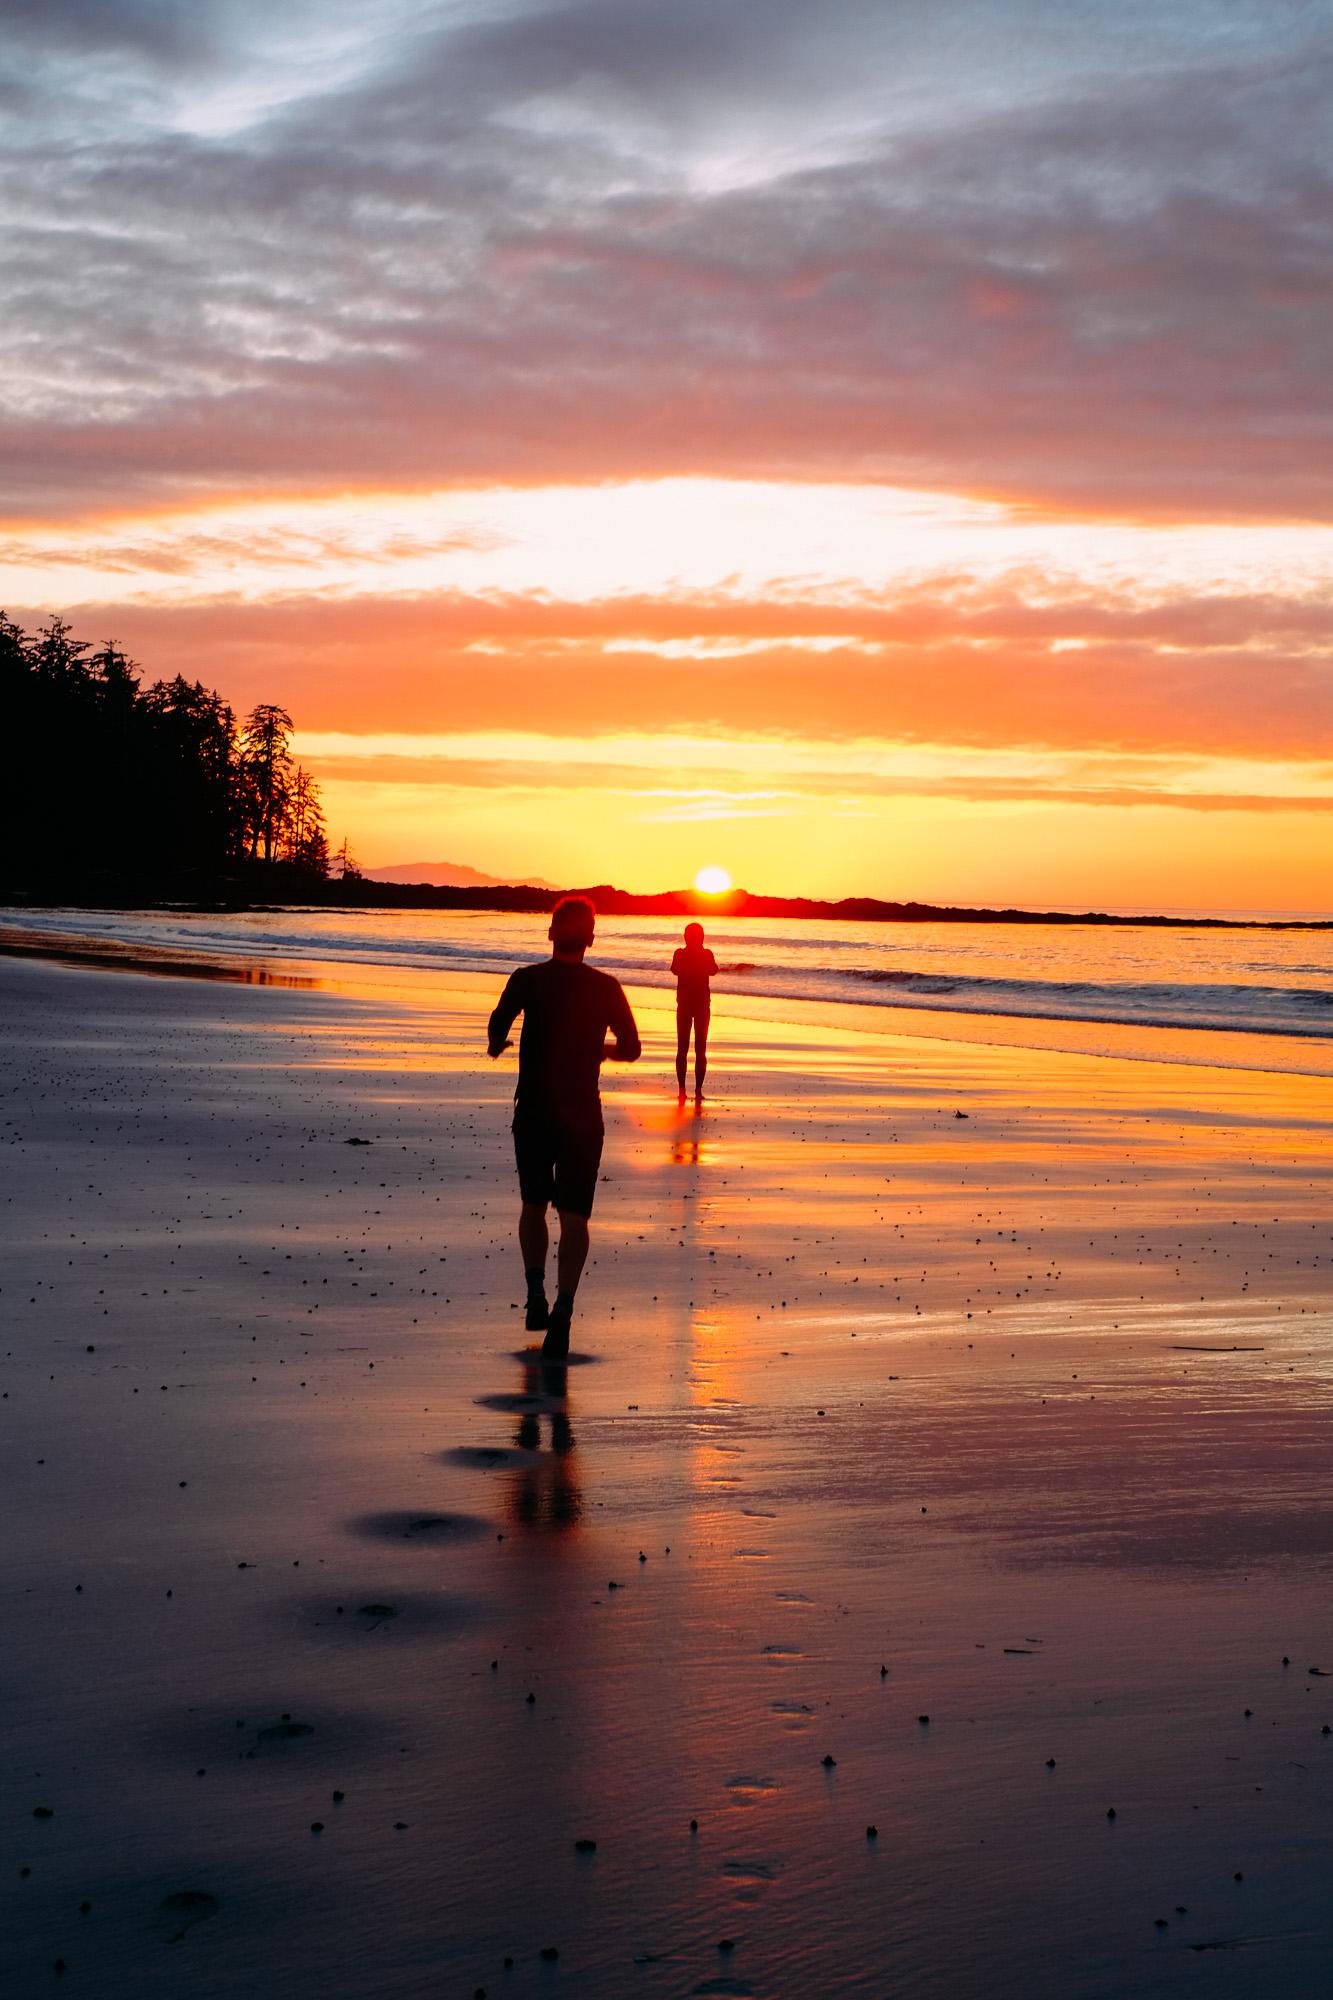 A man runs to his woman while the sun sets at Cape Scott.